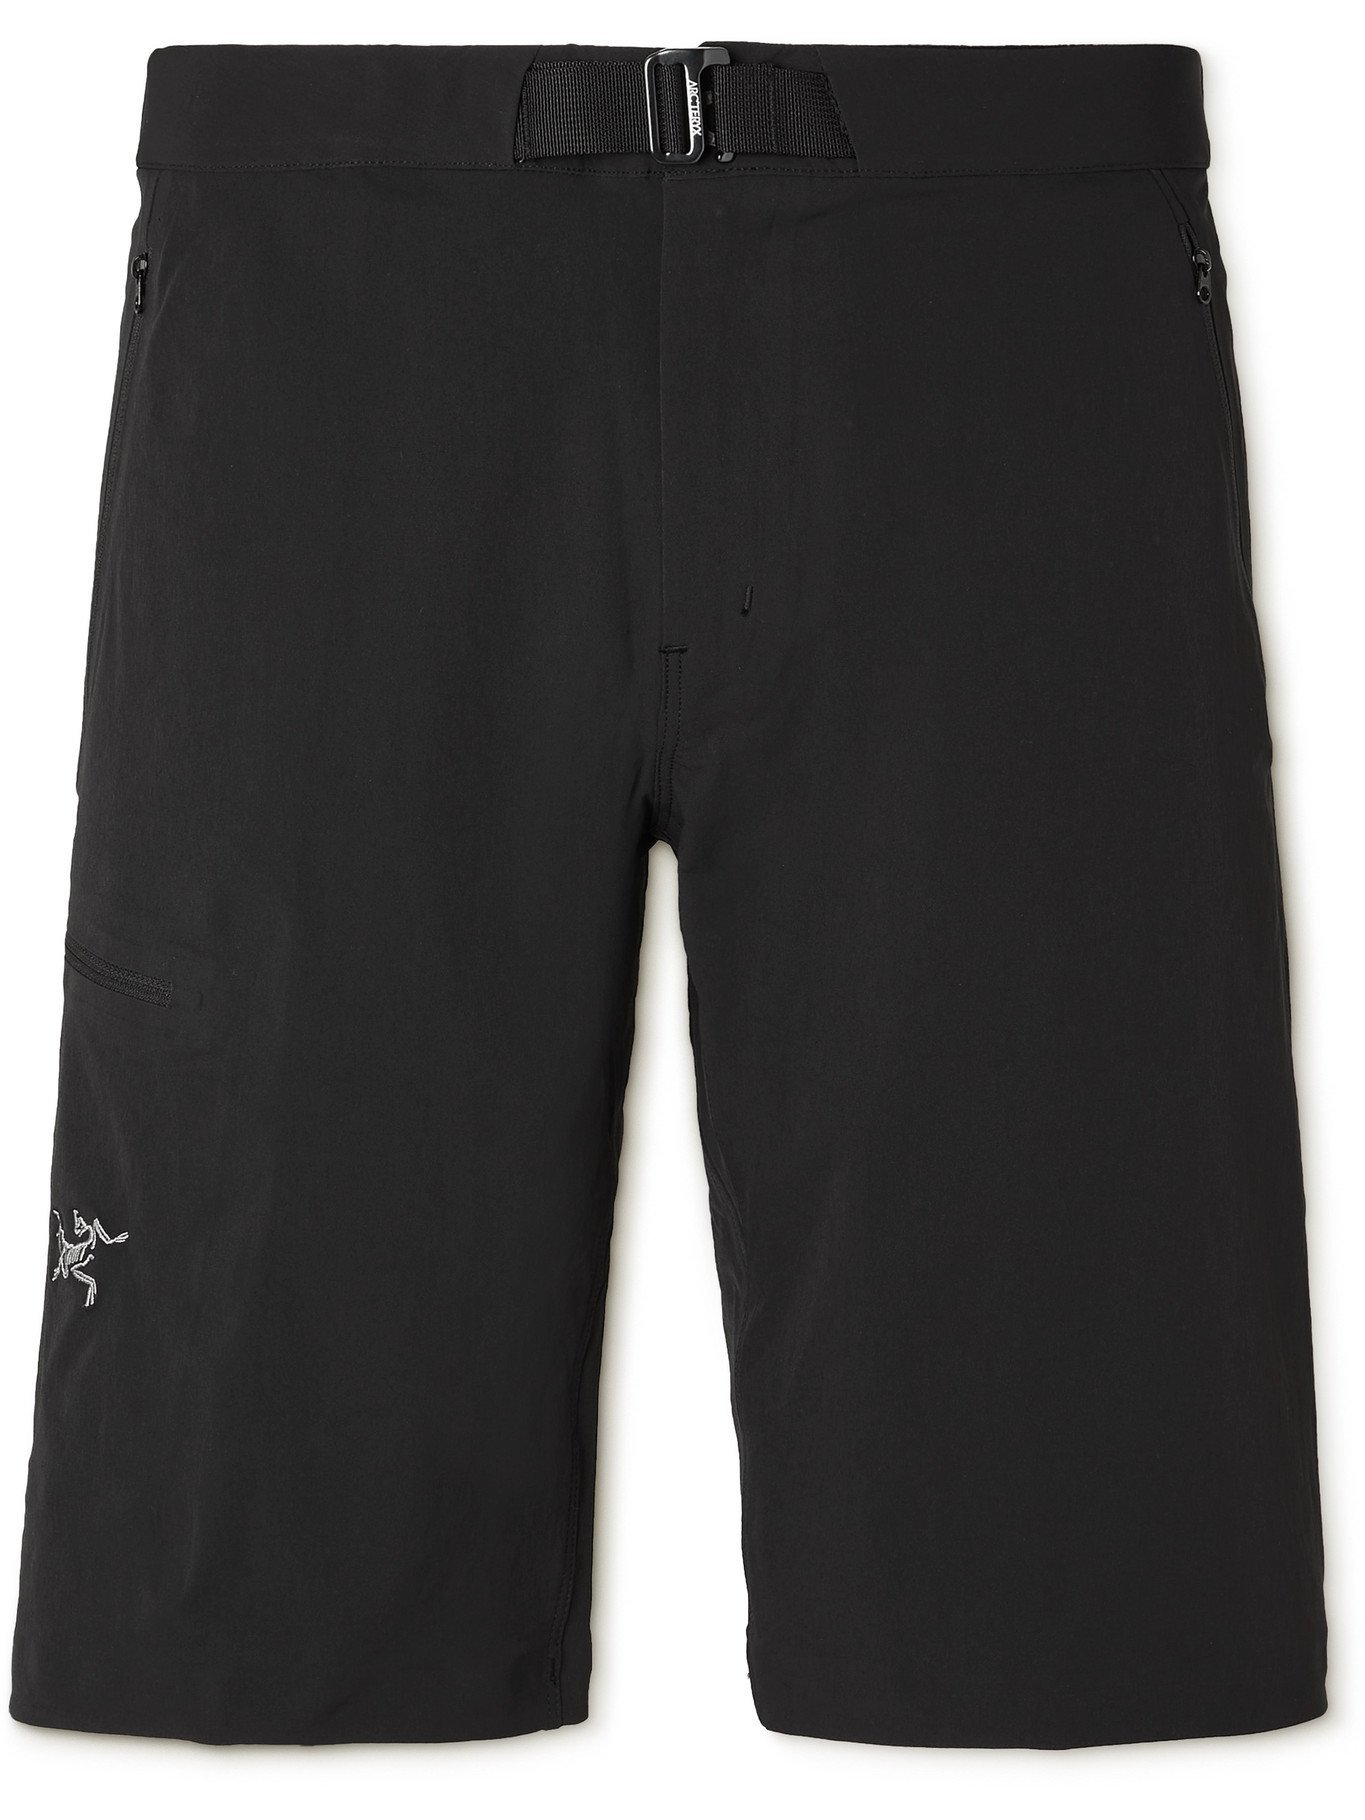 Photo: ARC'TERYX - Gamma LT Belted Fortius DW 2.0 Shorts - Black